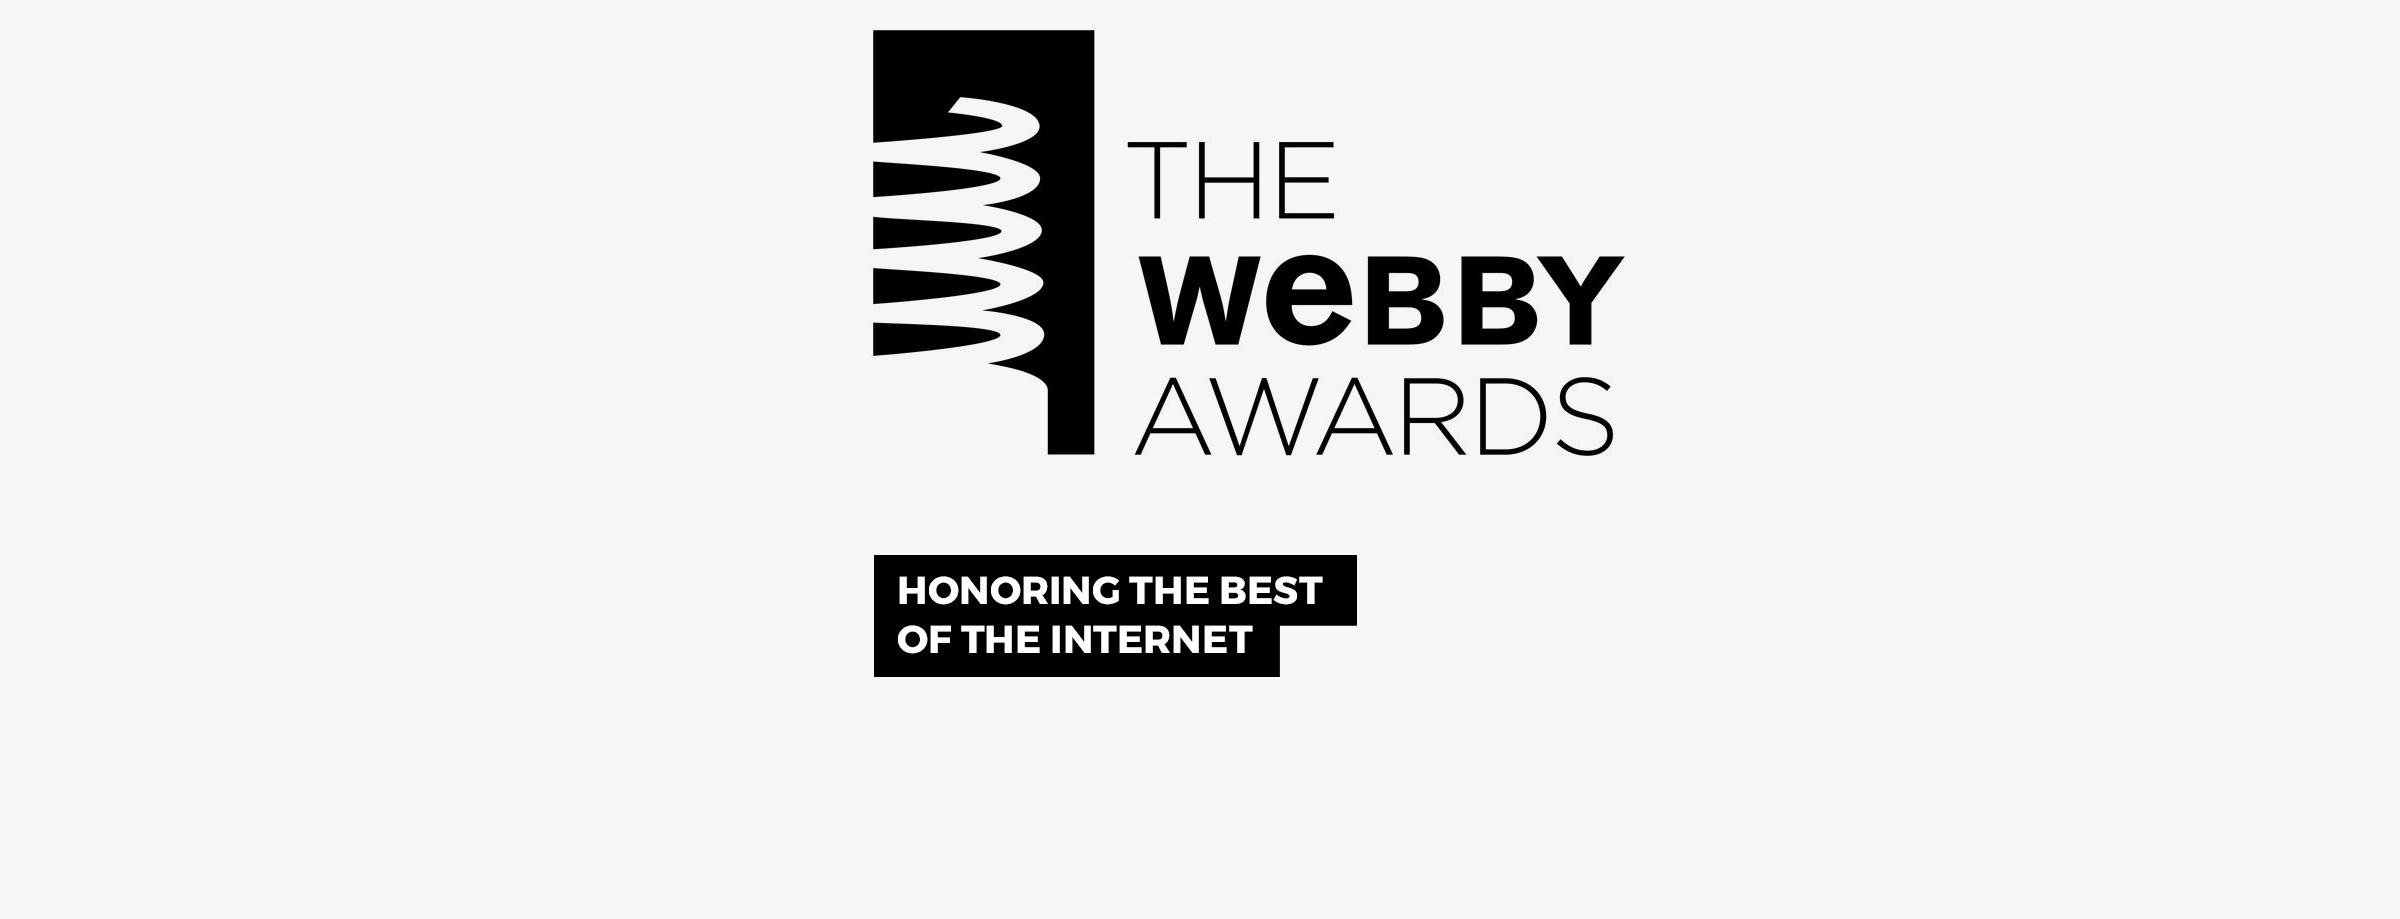 Webby-Awards-graphic3.jpg